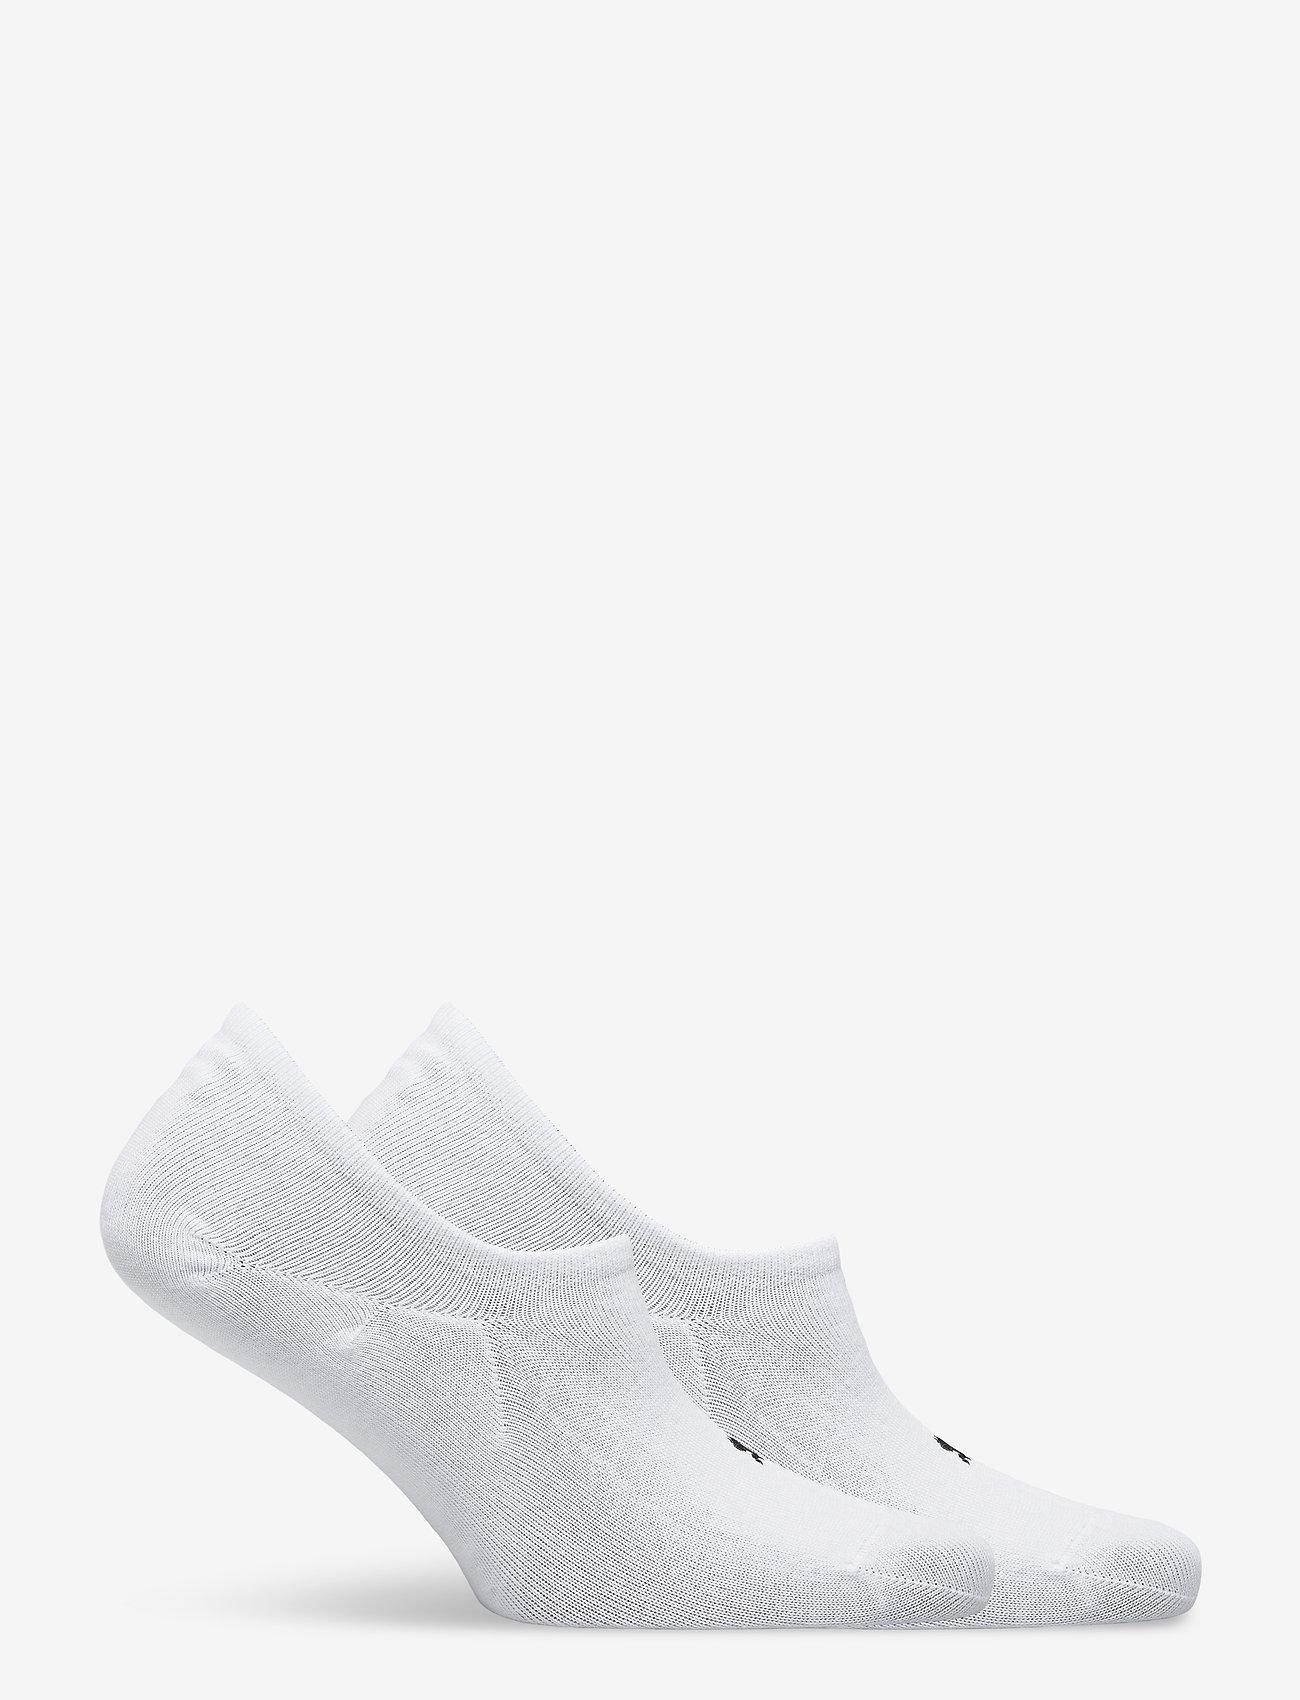 PUMA - PUMA UNISEX FOOTIE 2P HIGH CUT - ankelstrumpor - white - 1